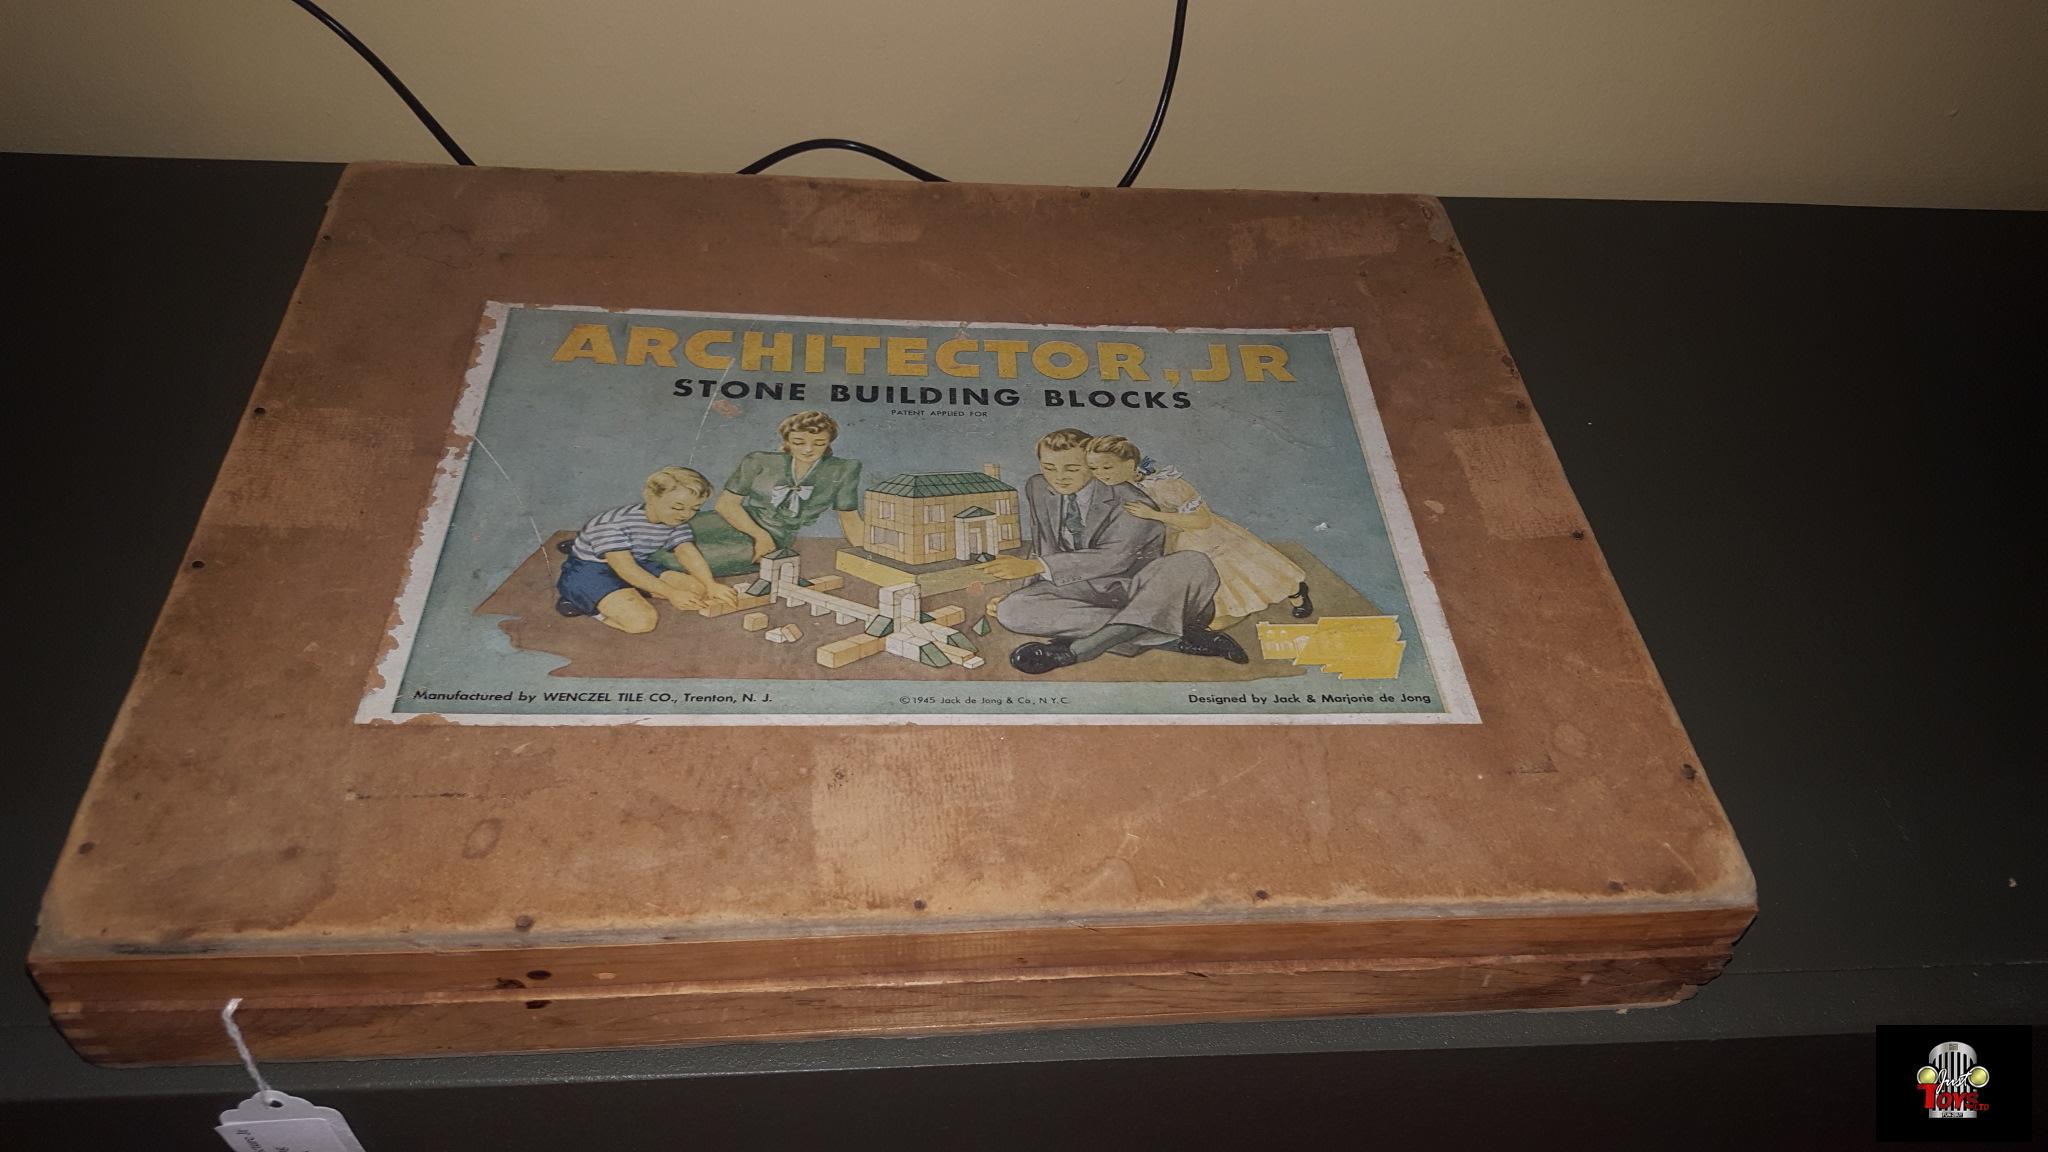 Architector Jr Stone Building Blocks Set